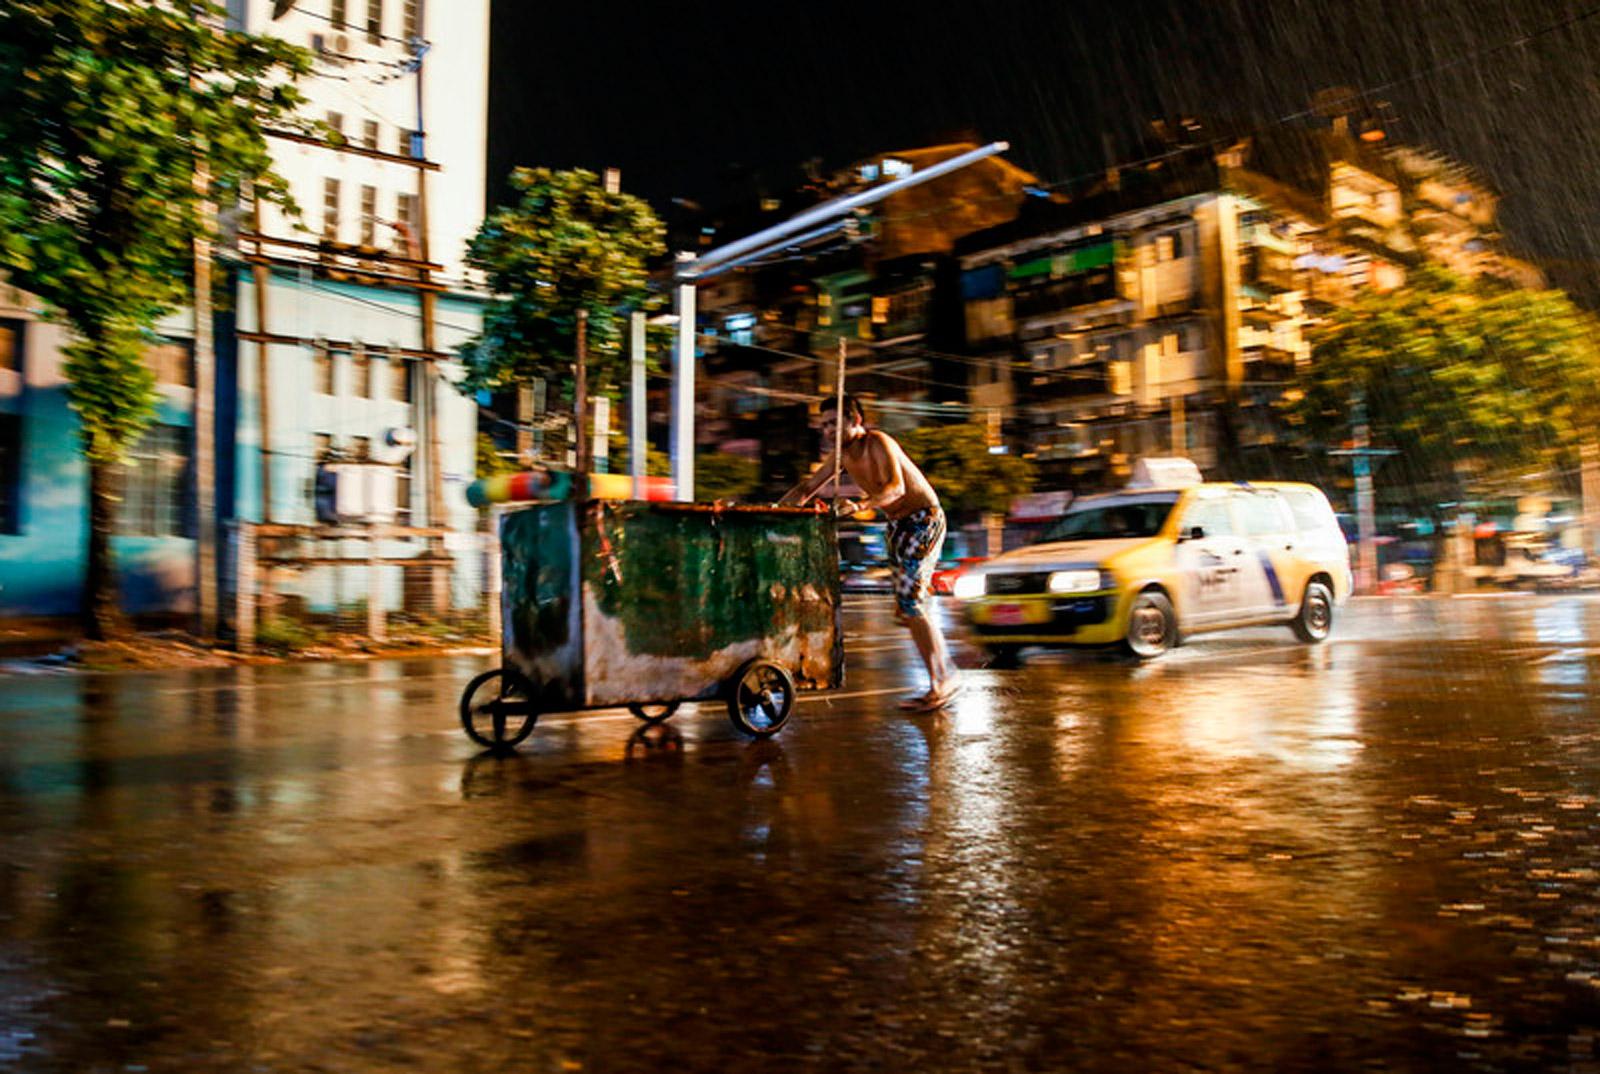 Street vendor pulls cart in Yangon during rainy season, June 2017. Photo: EPA/Lynn Bo Bo